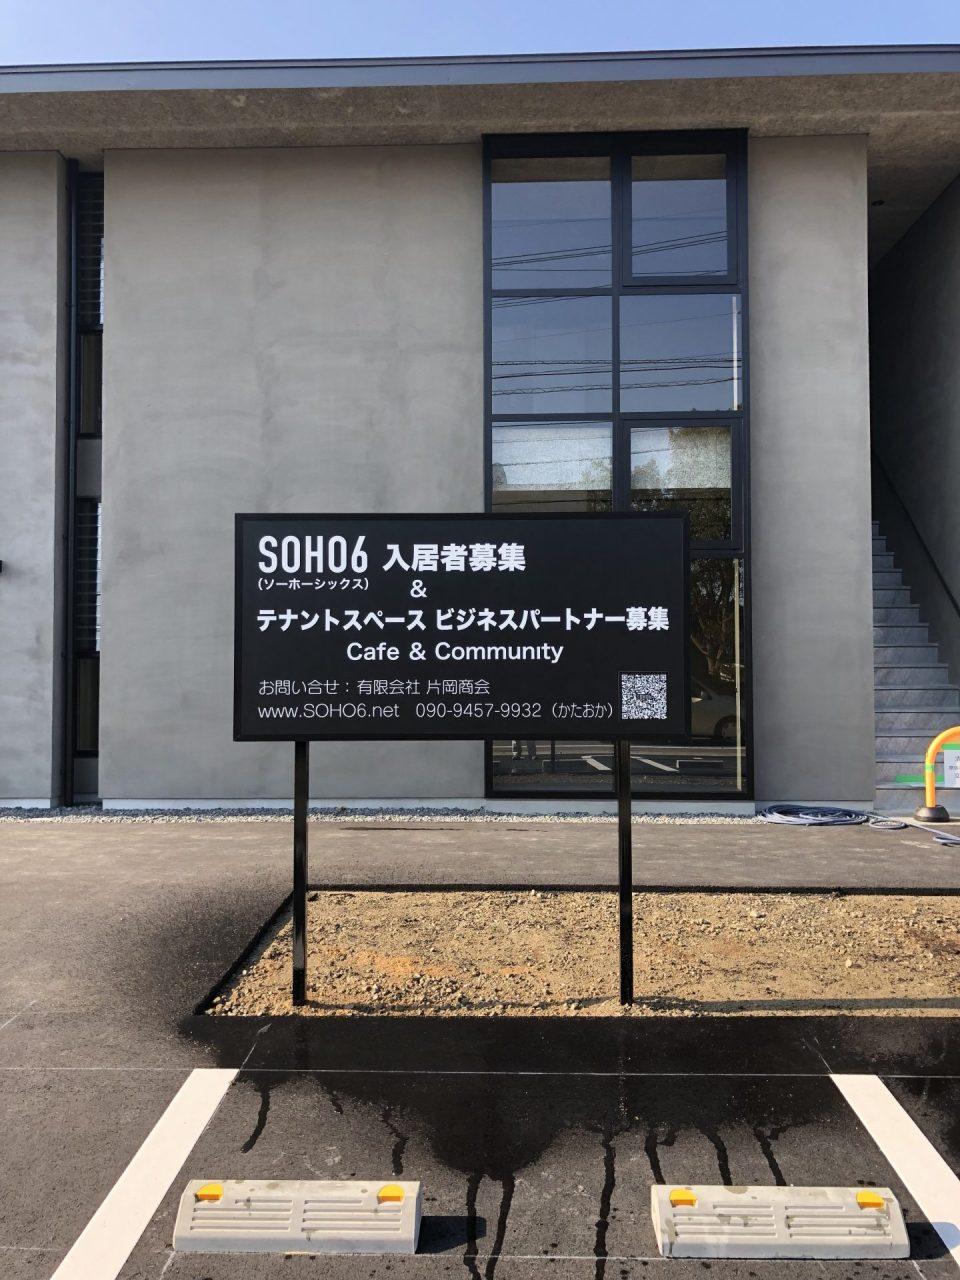 #Apartment/SOHO6